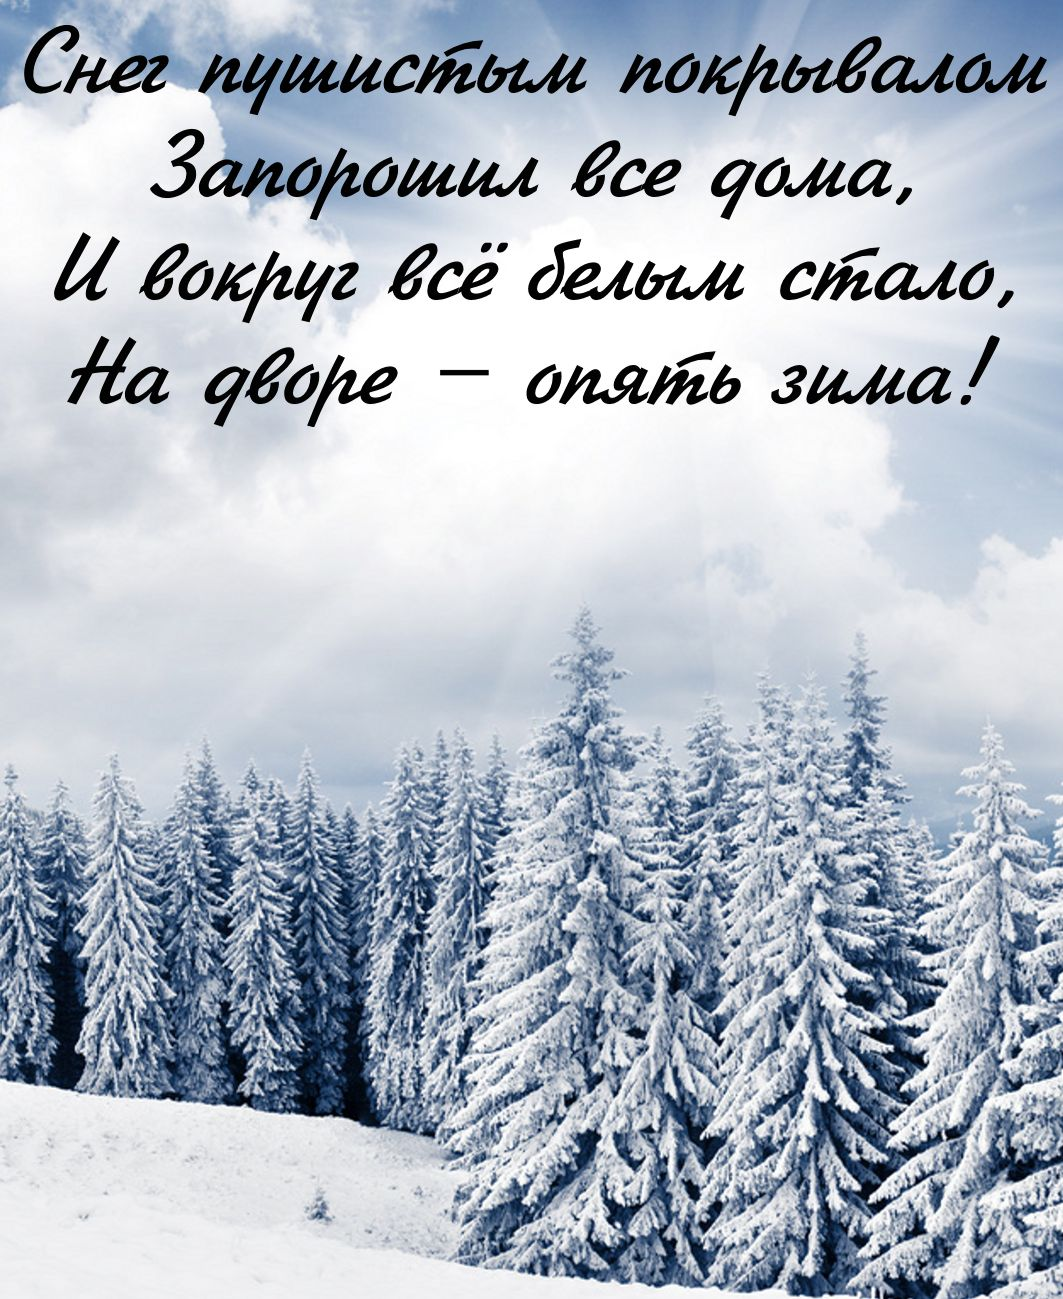 картинки зима со стихами про жизнь очень